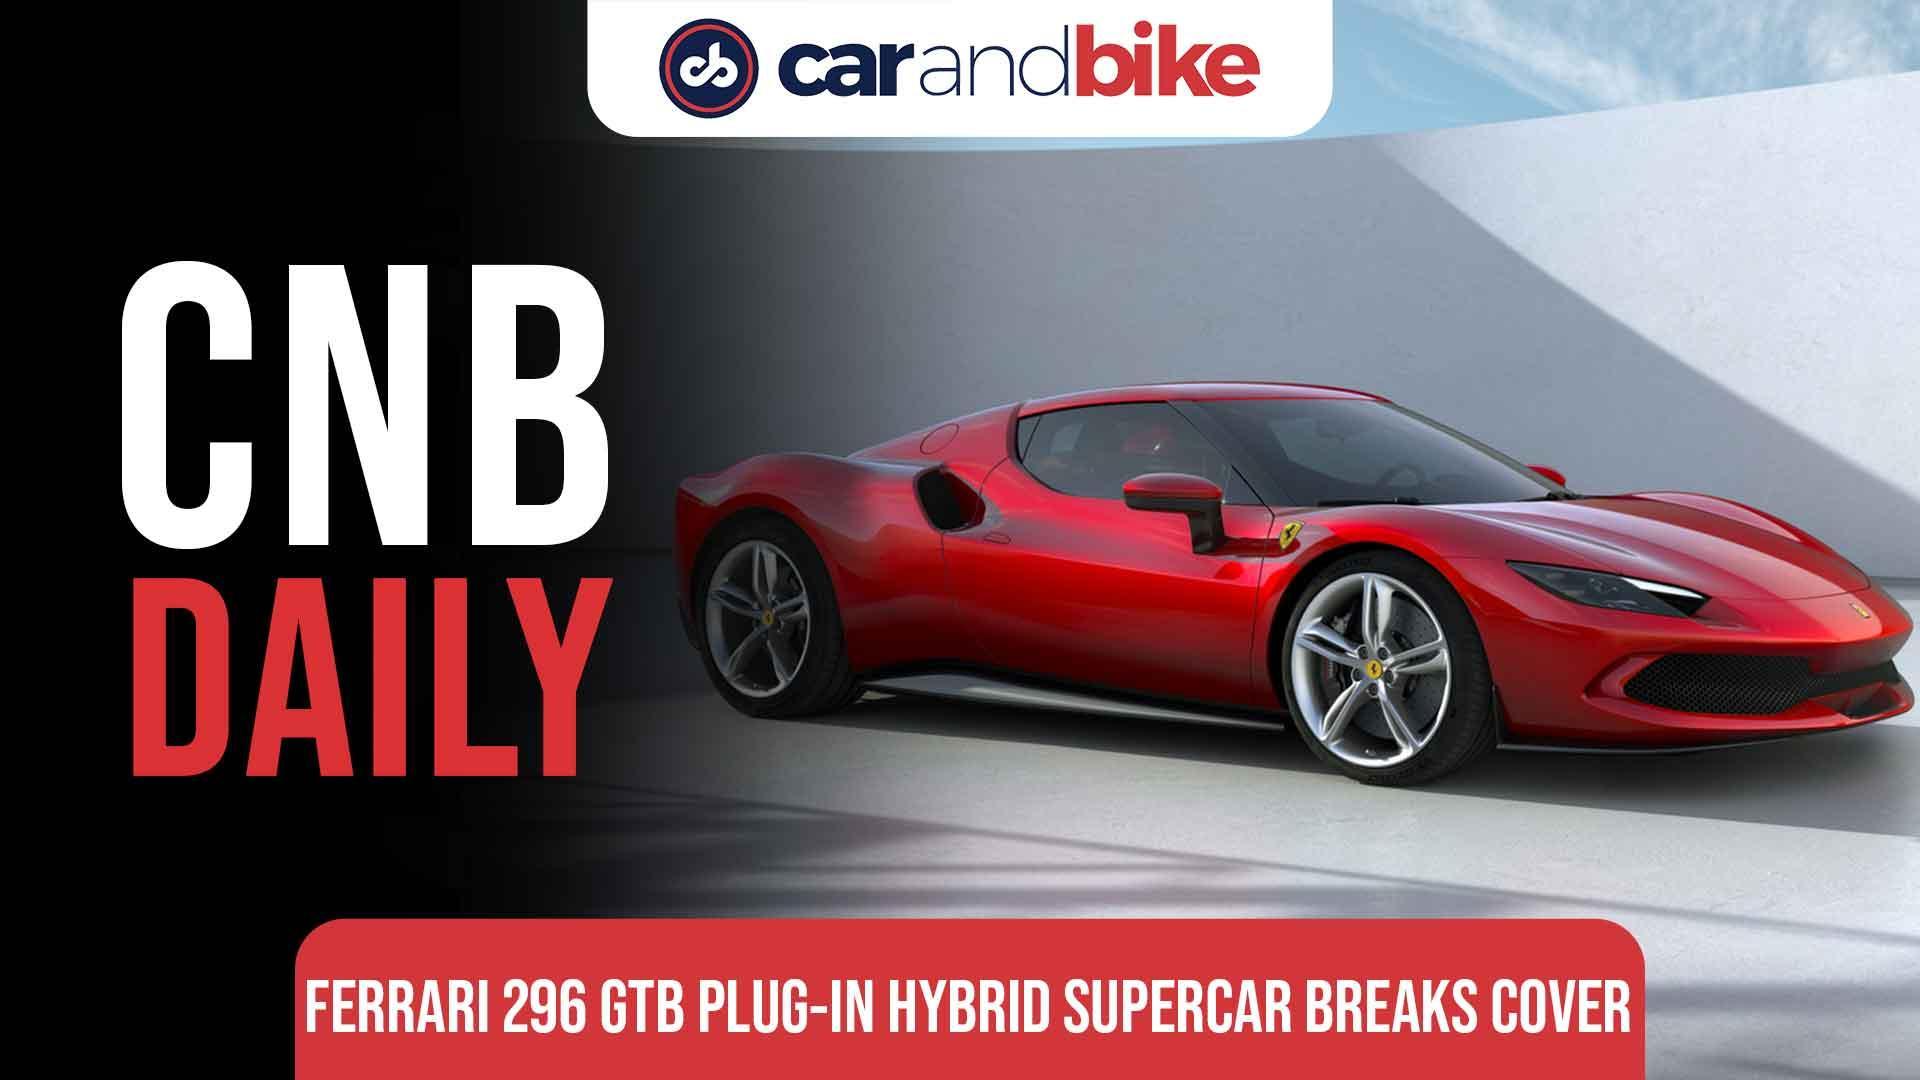 Ferrari 296 GTB Plug-In Hybrid Supercar Breaks Cover